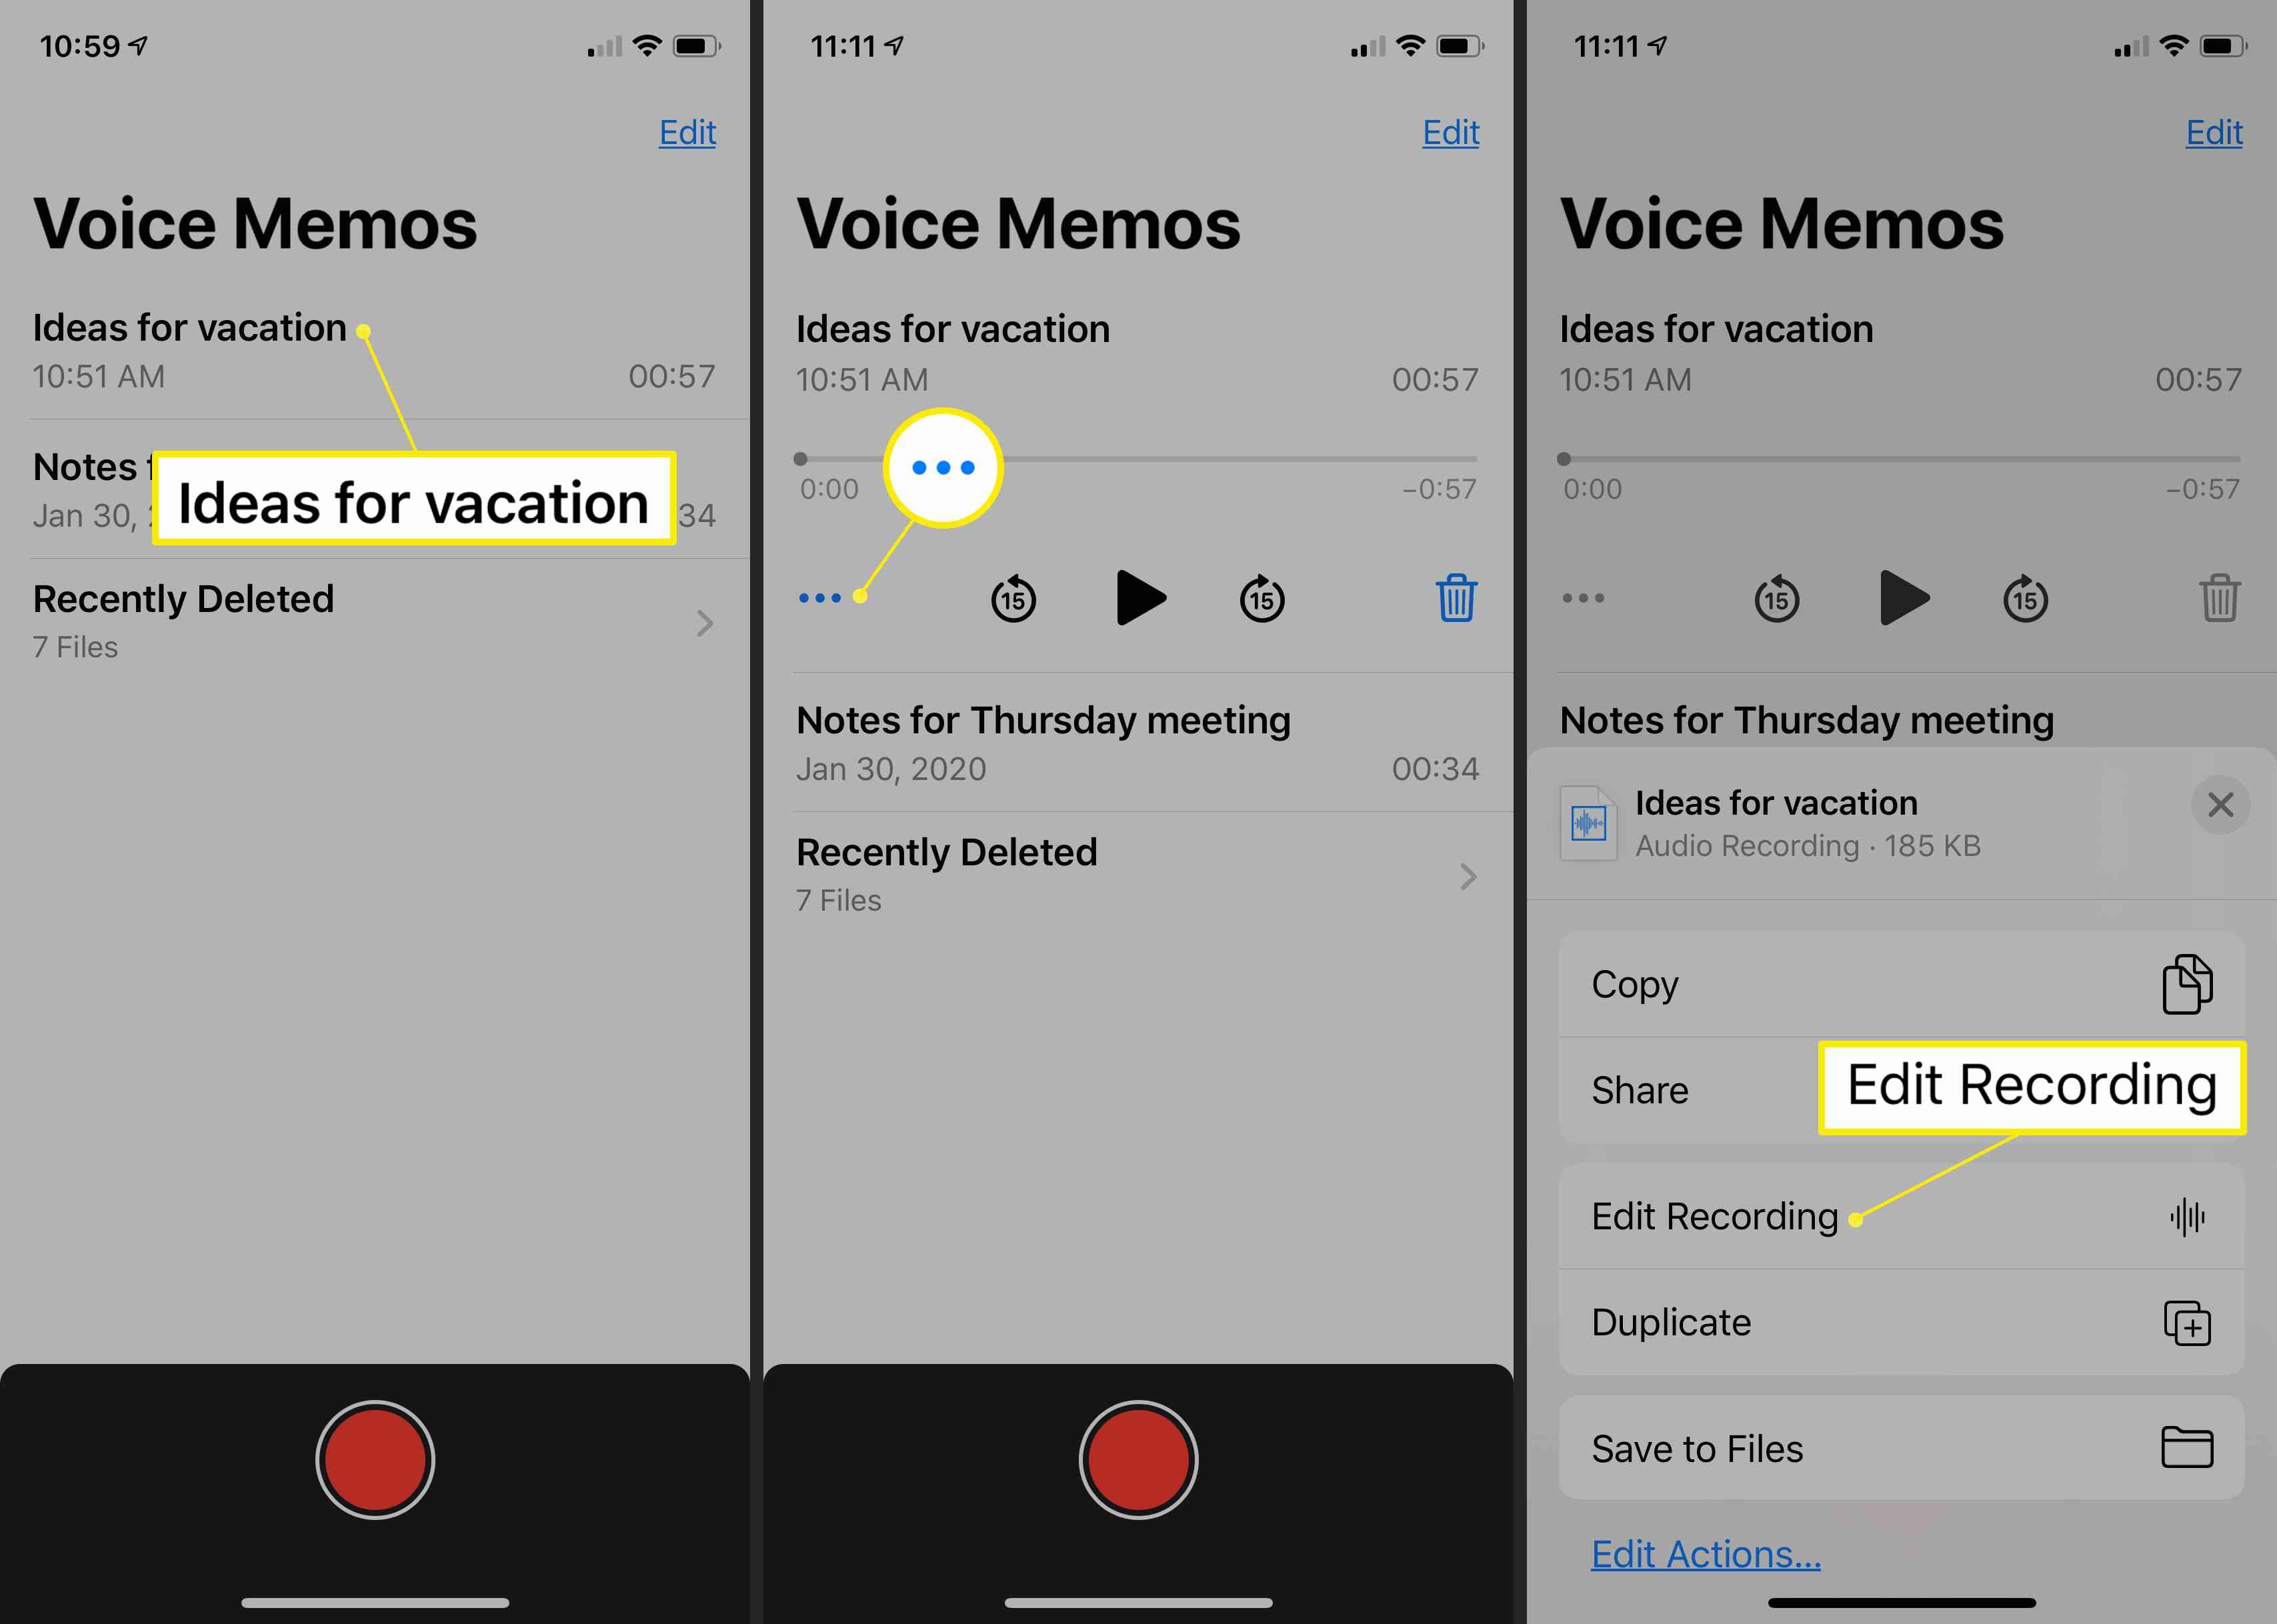 Voice Memos on iPhone showing menu